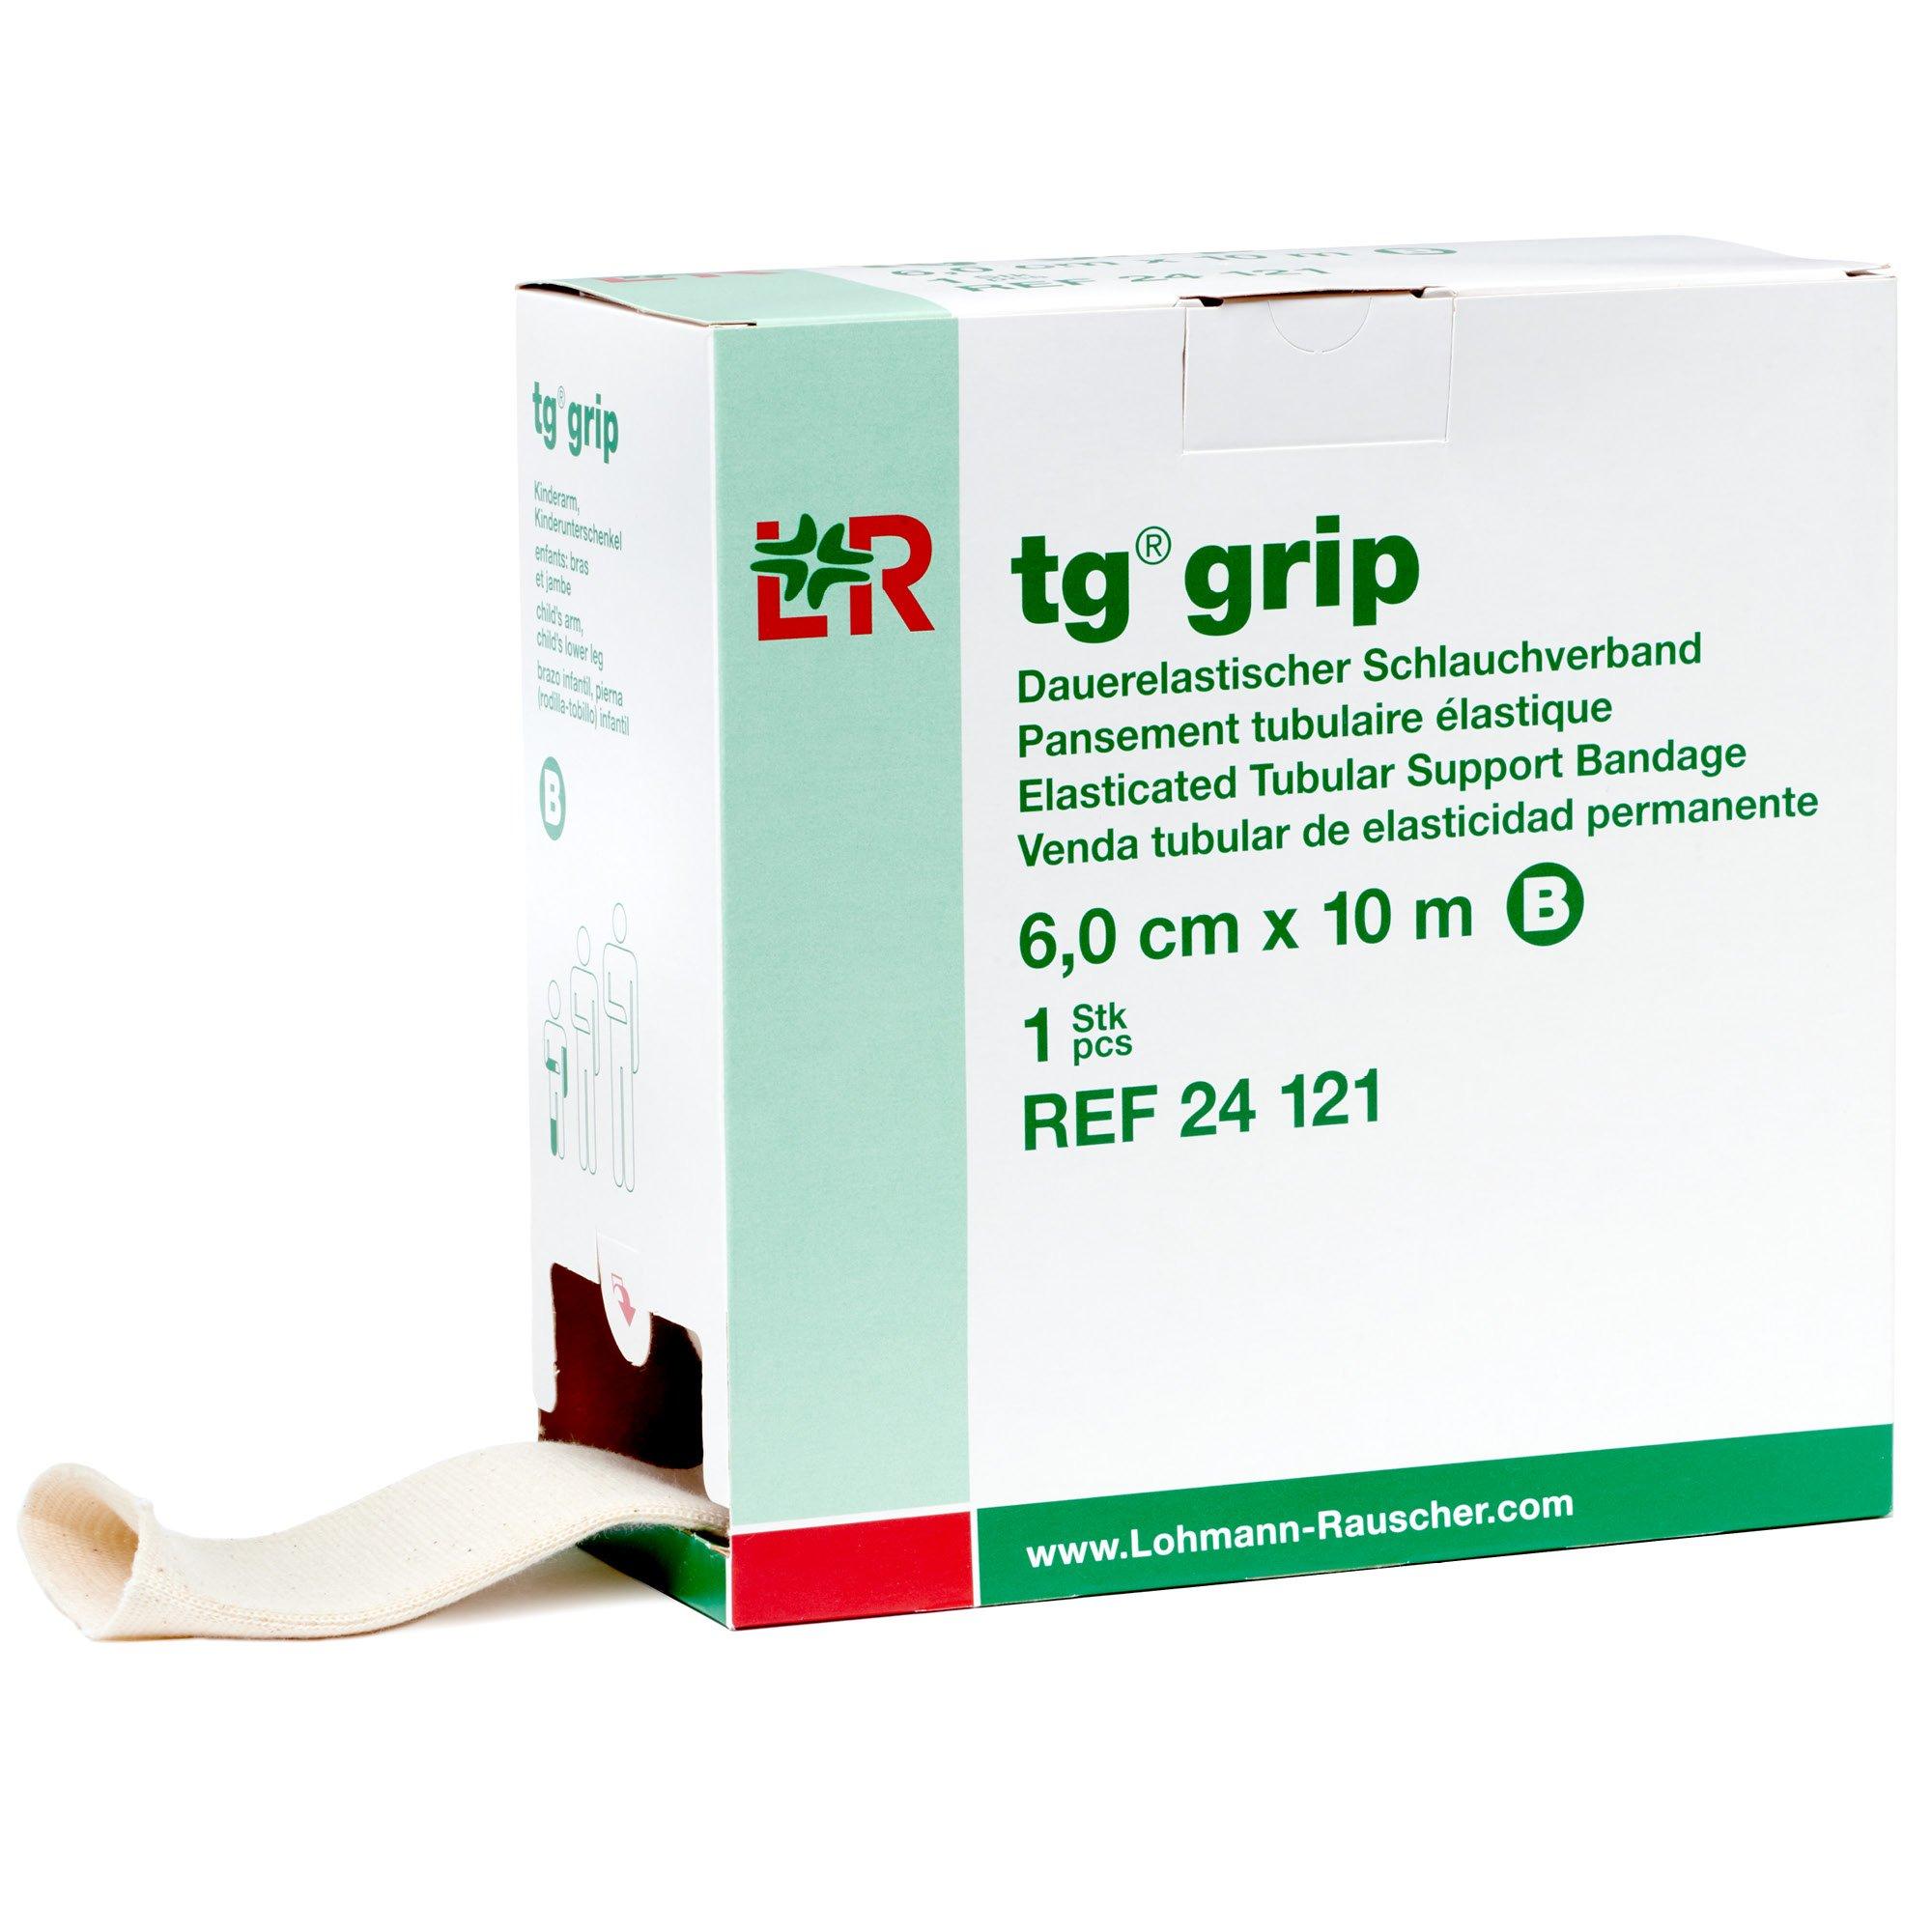 tg Grip Elastic Tubular Compression Bandage, Seamless Tube Stockinette Wrap for Retention, Lymphedema, Swelling, 85% Cotton, Washable & Reusable, Size B